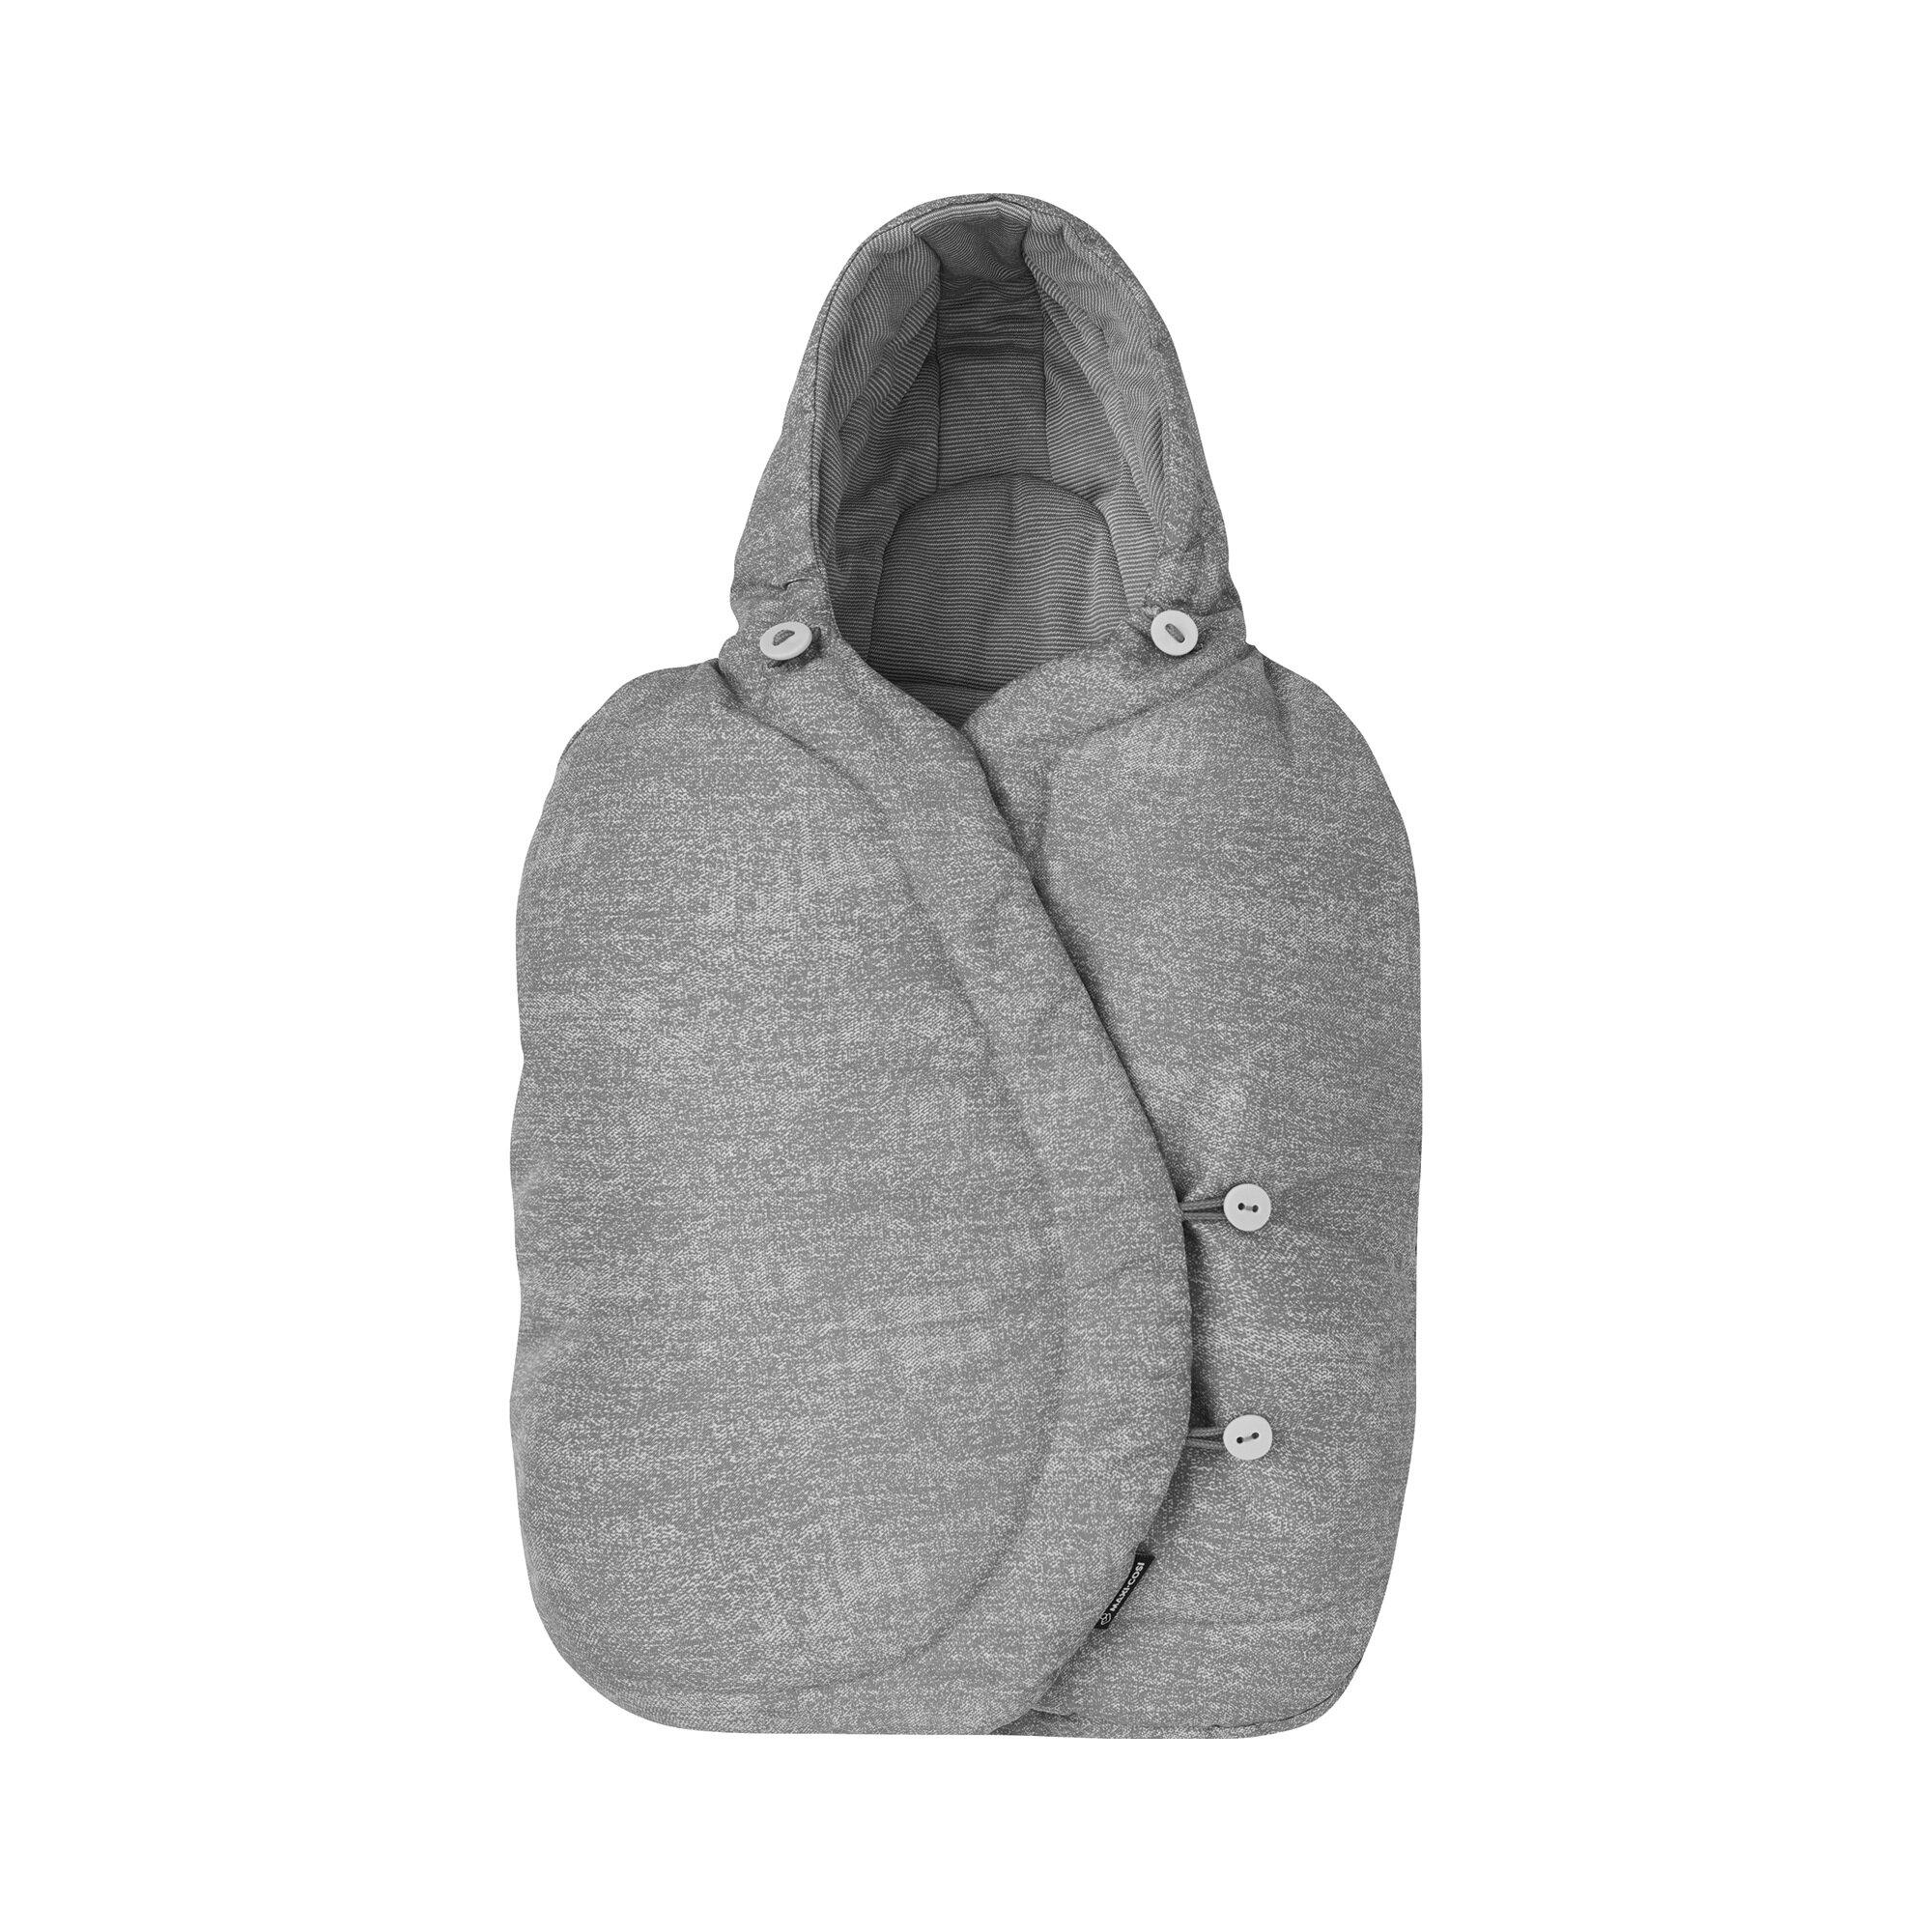 Maxi-Cosi Winter-Fußsack für CabrioFix, Pebble, Pebble Plus, Citi, Rock